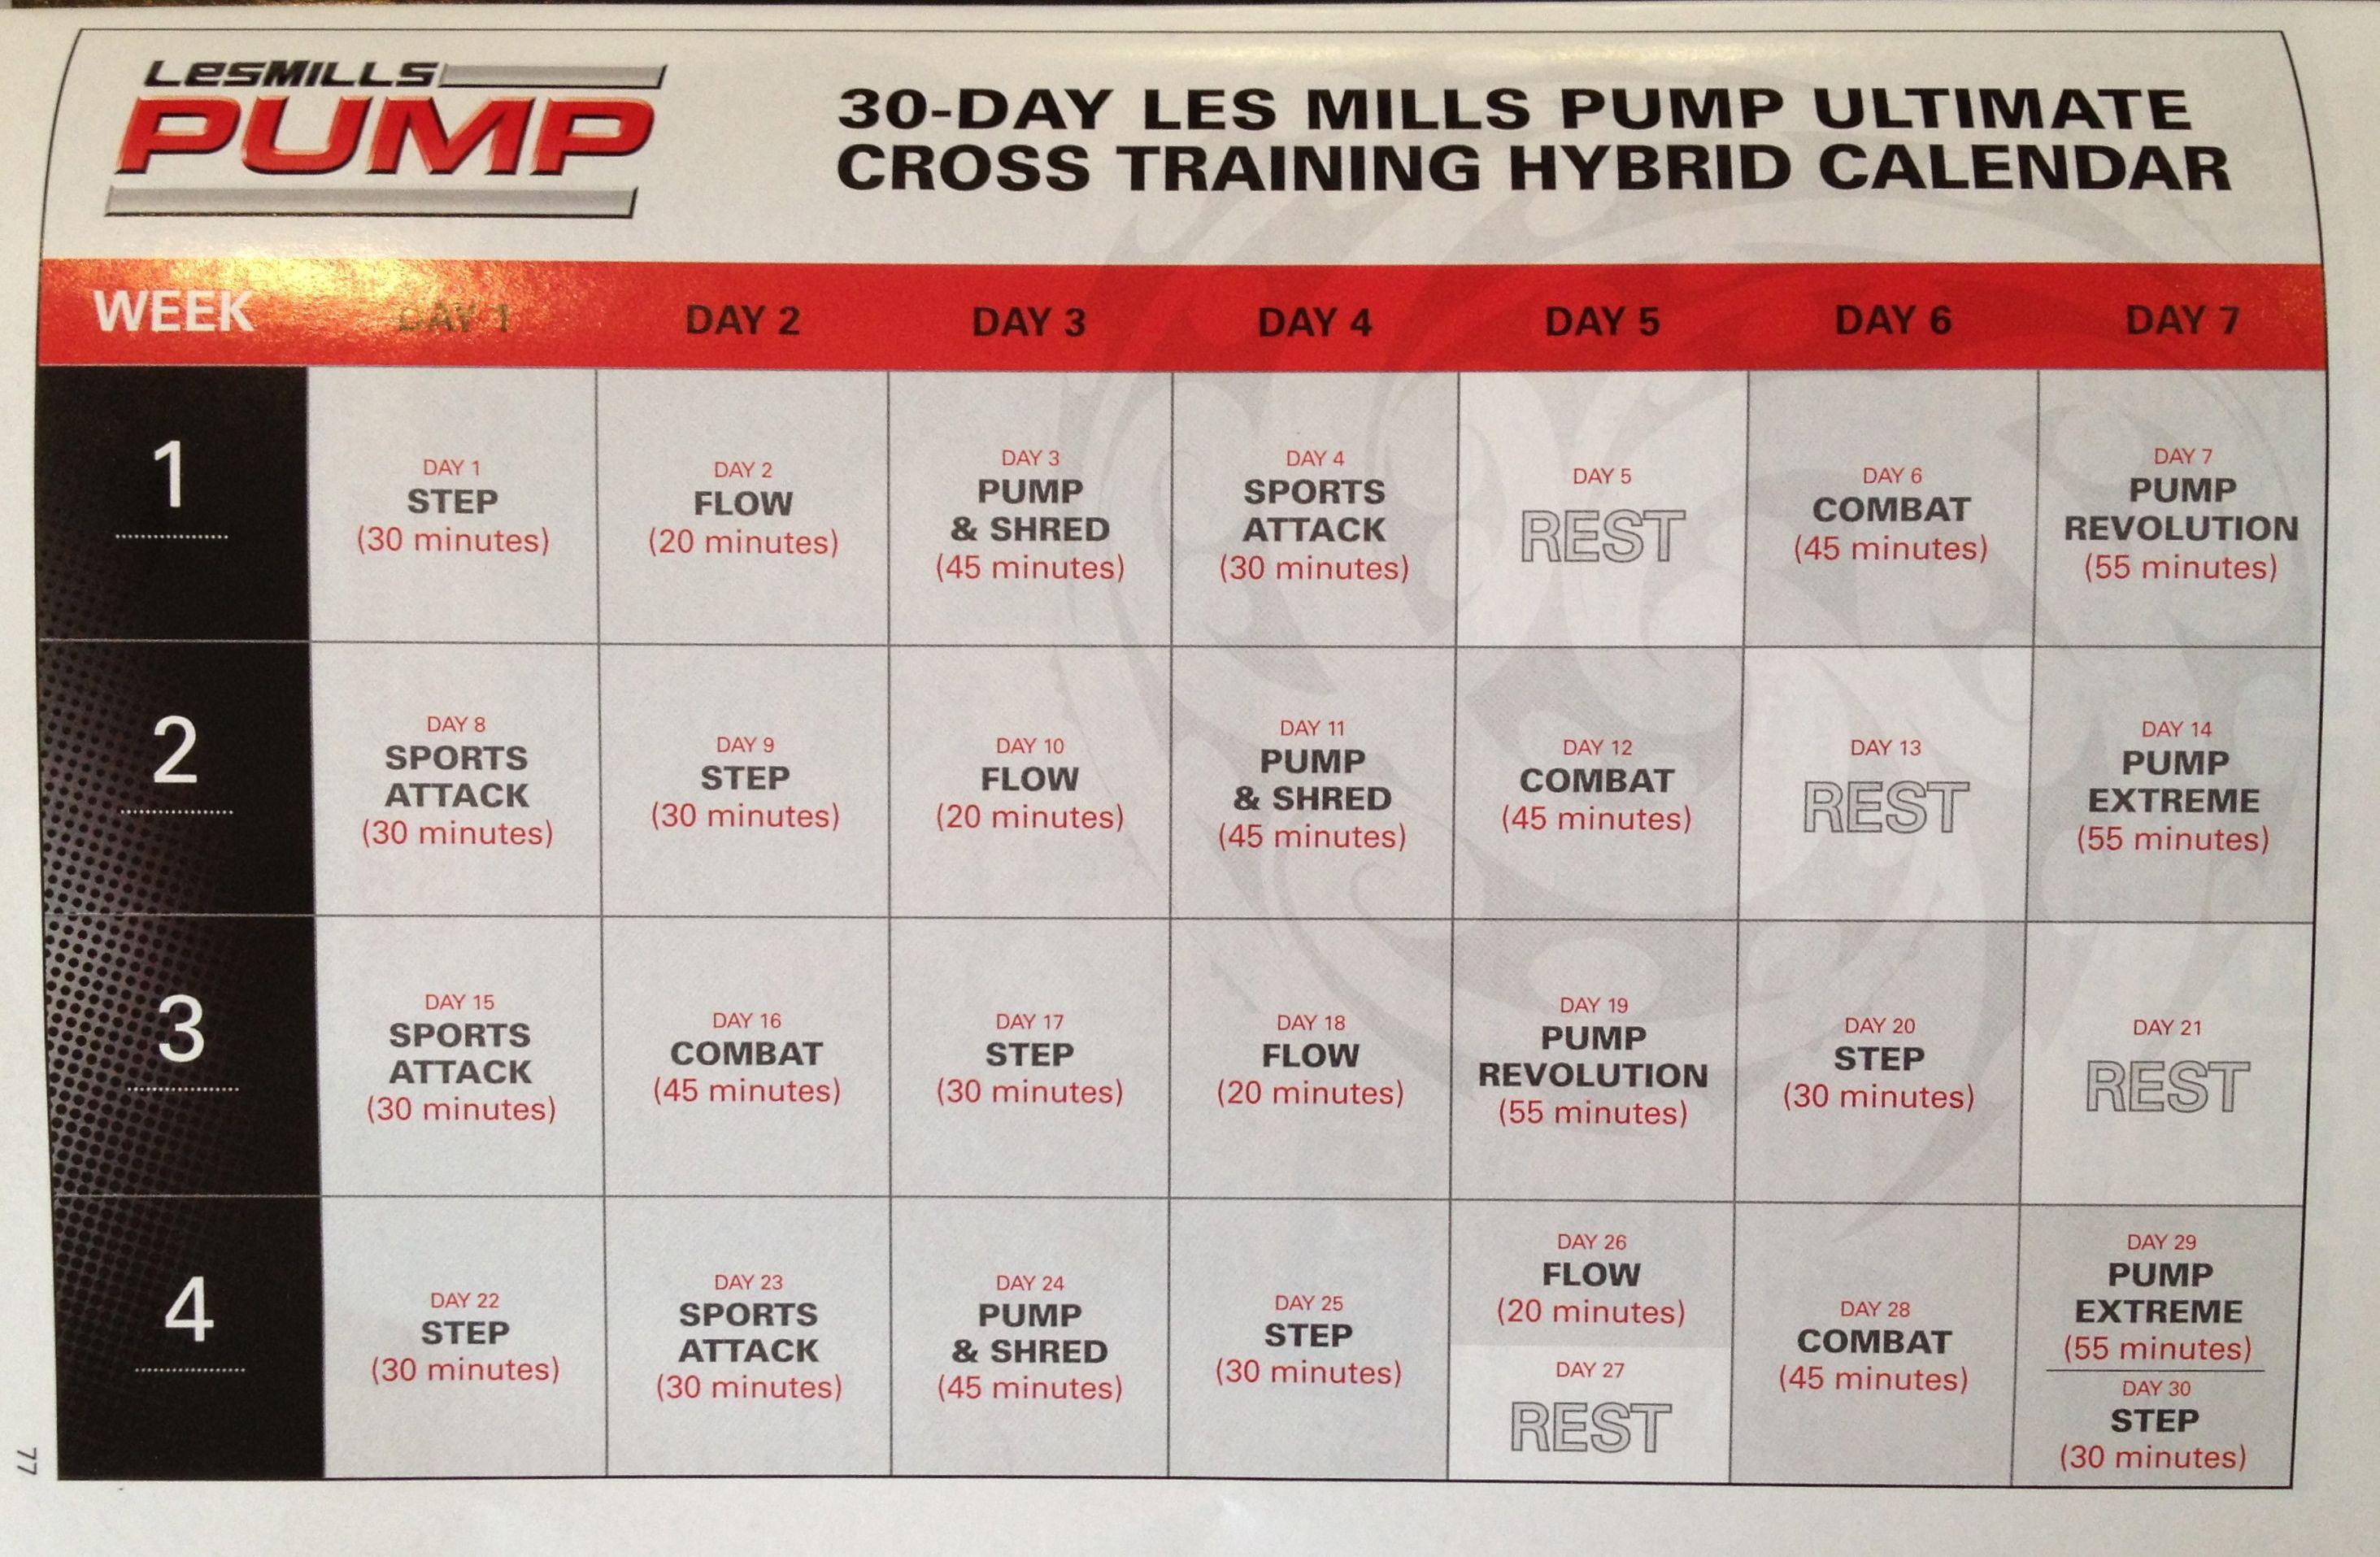 Les Mills PUMP Cross Training Hybrid Calendar